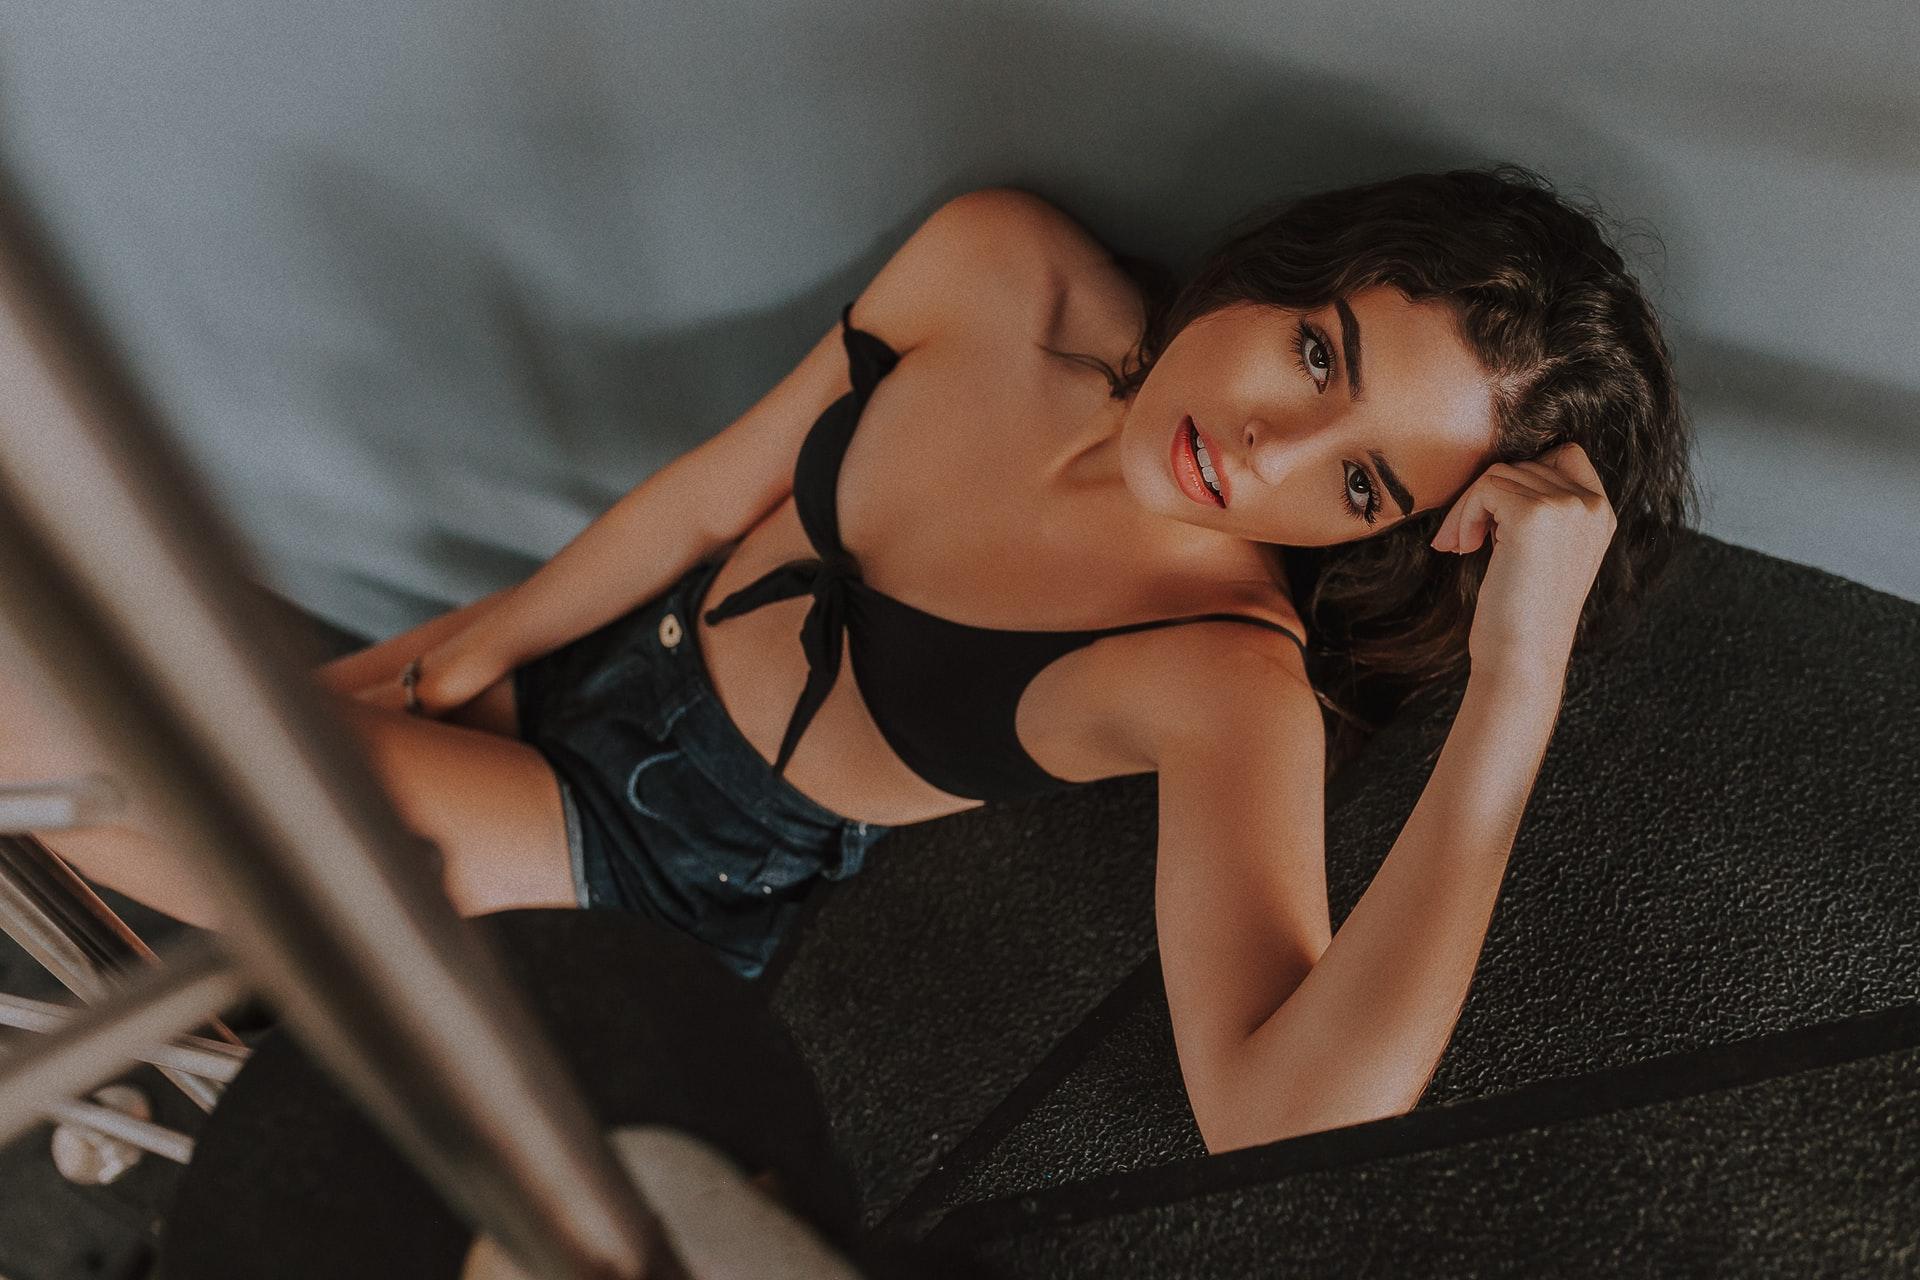 European hot Girl